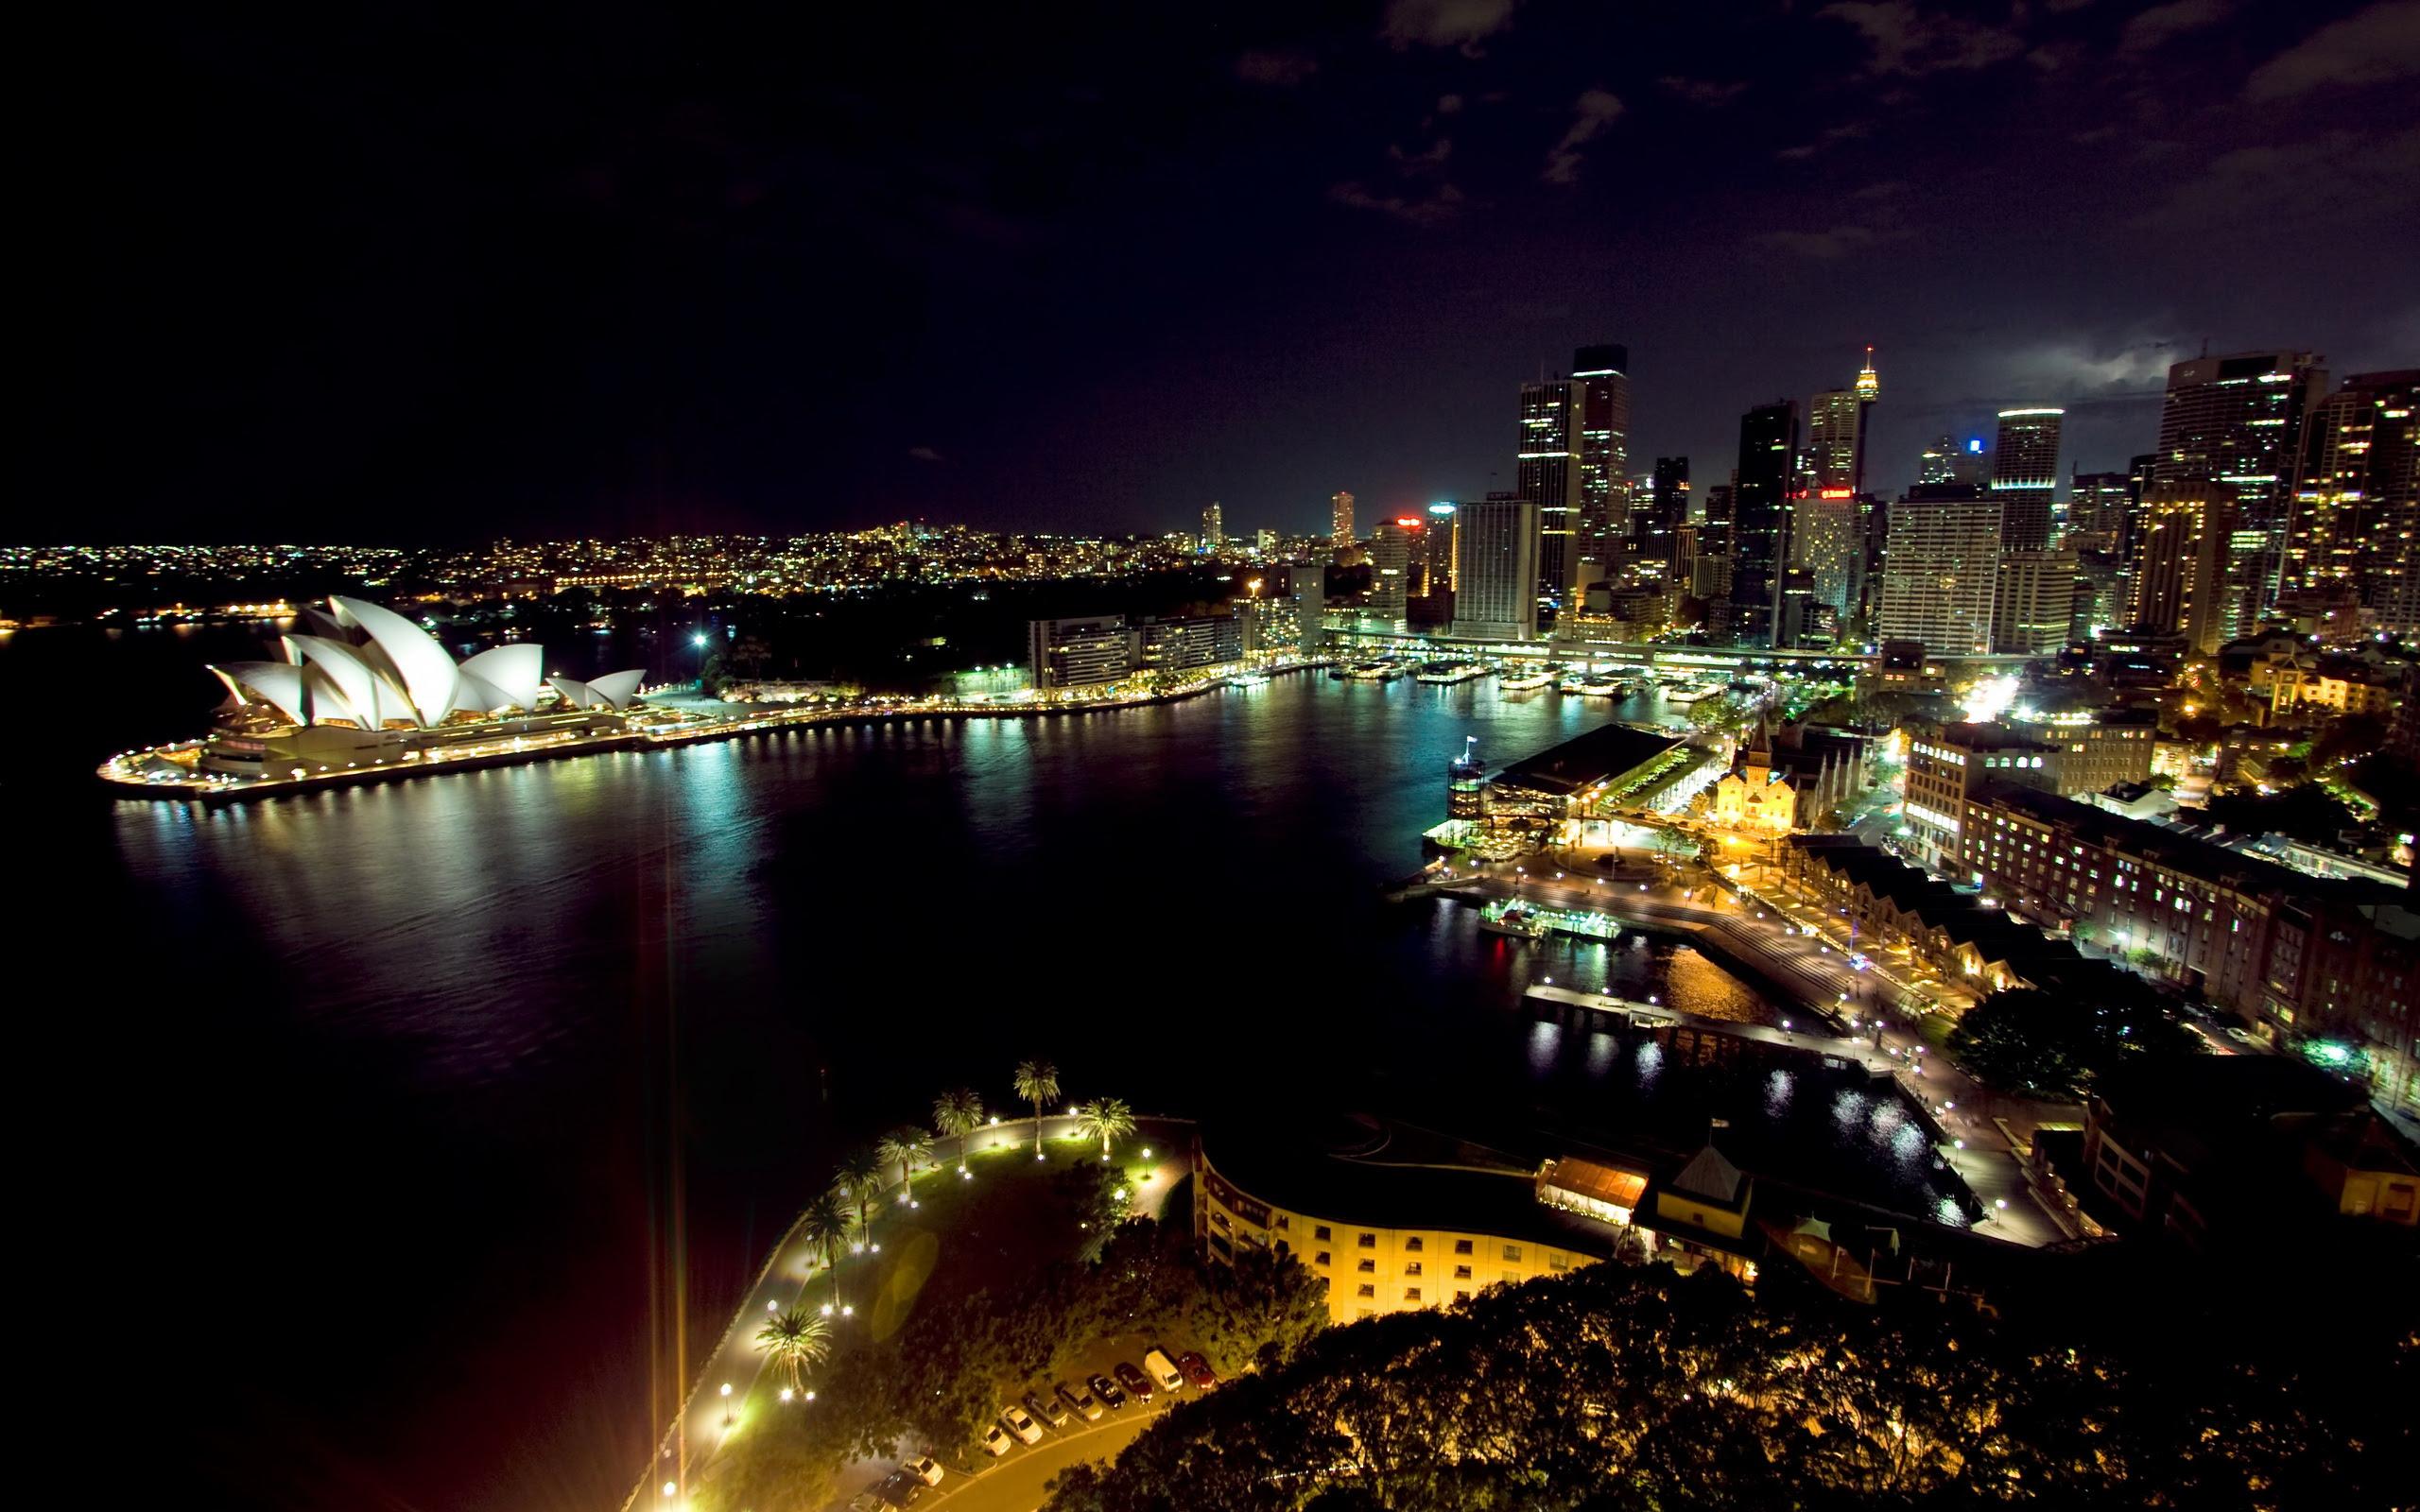 Sydney Australia | Celebrating Earth Hour [2560 X 1600]